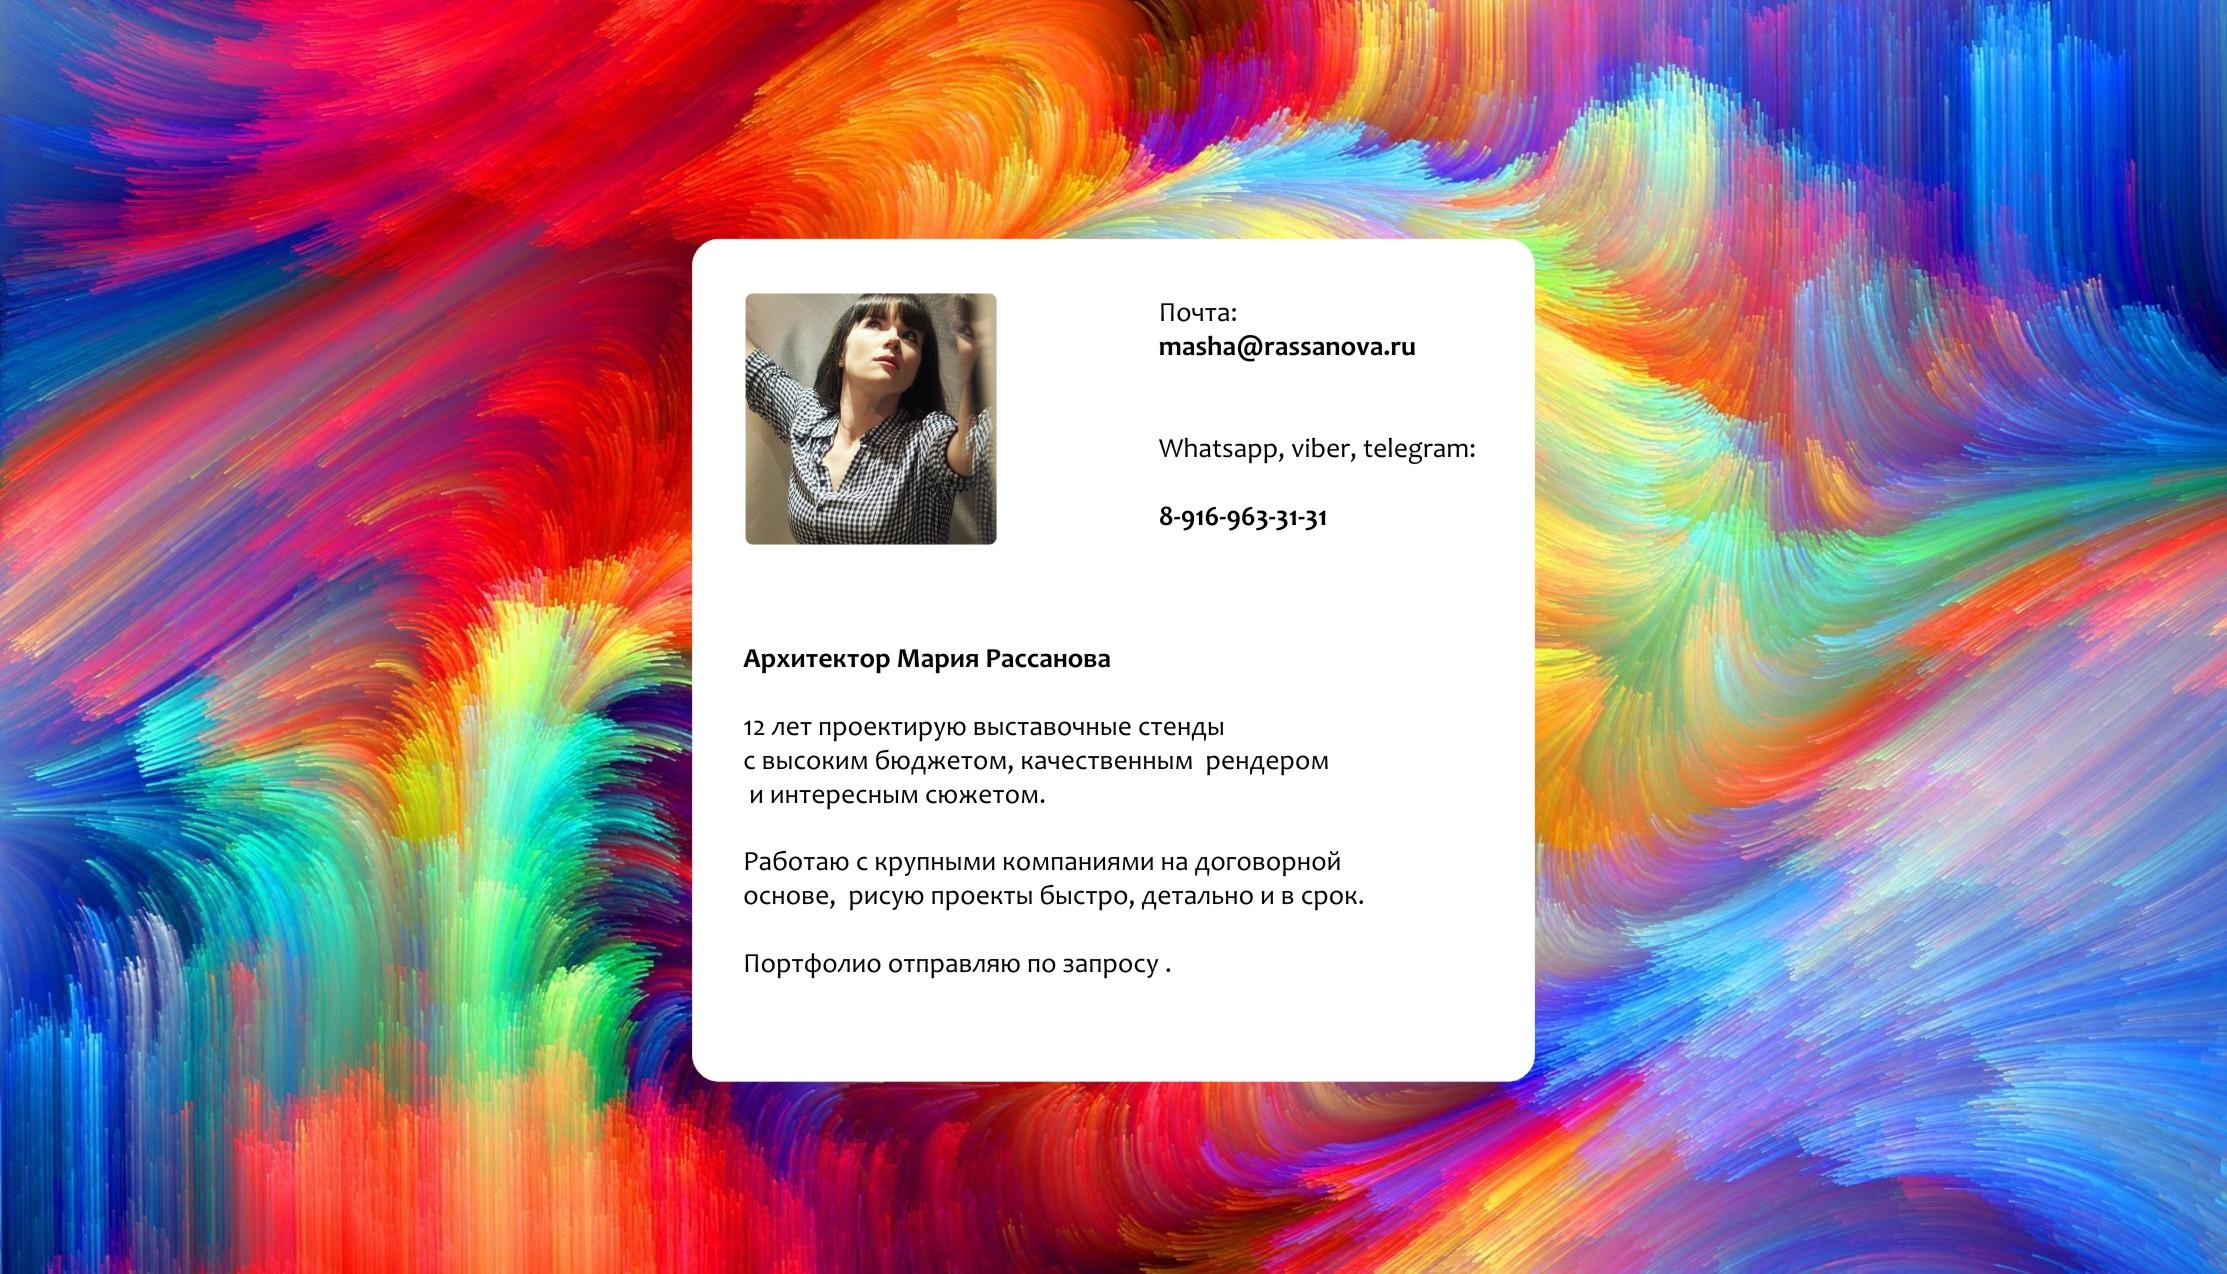 Маша Рассанова